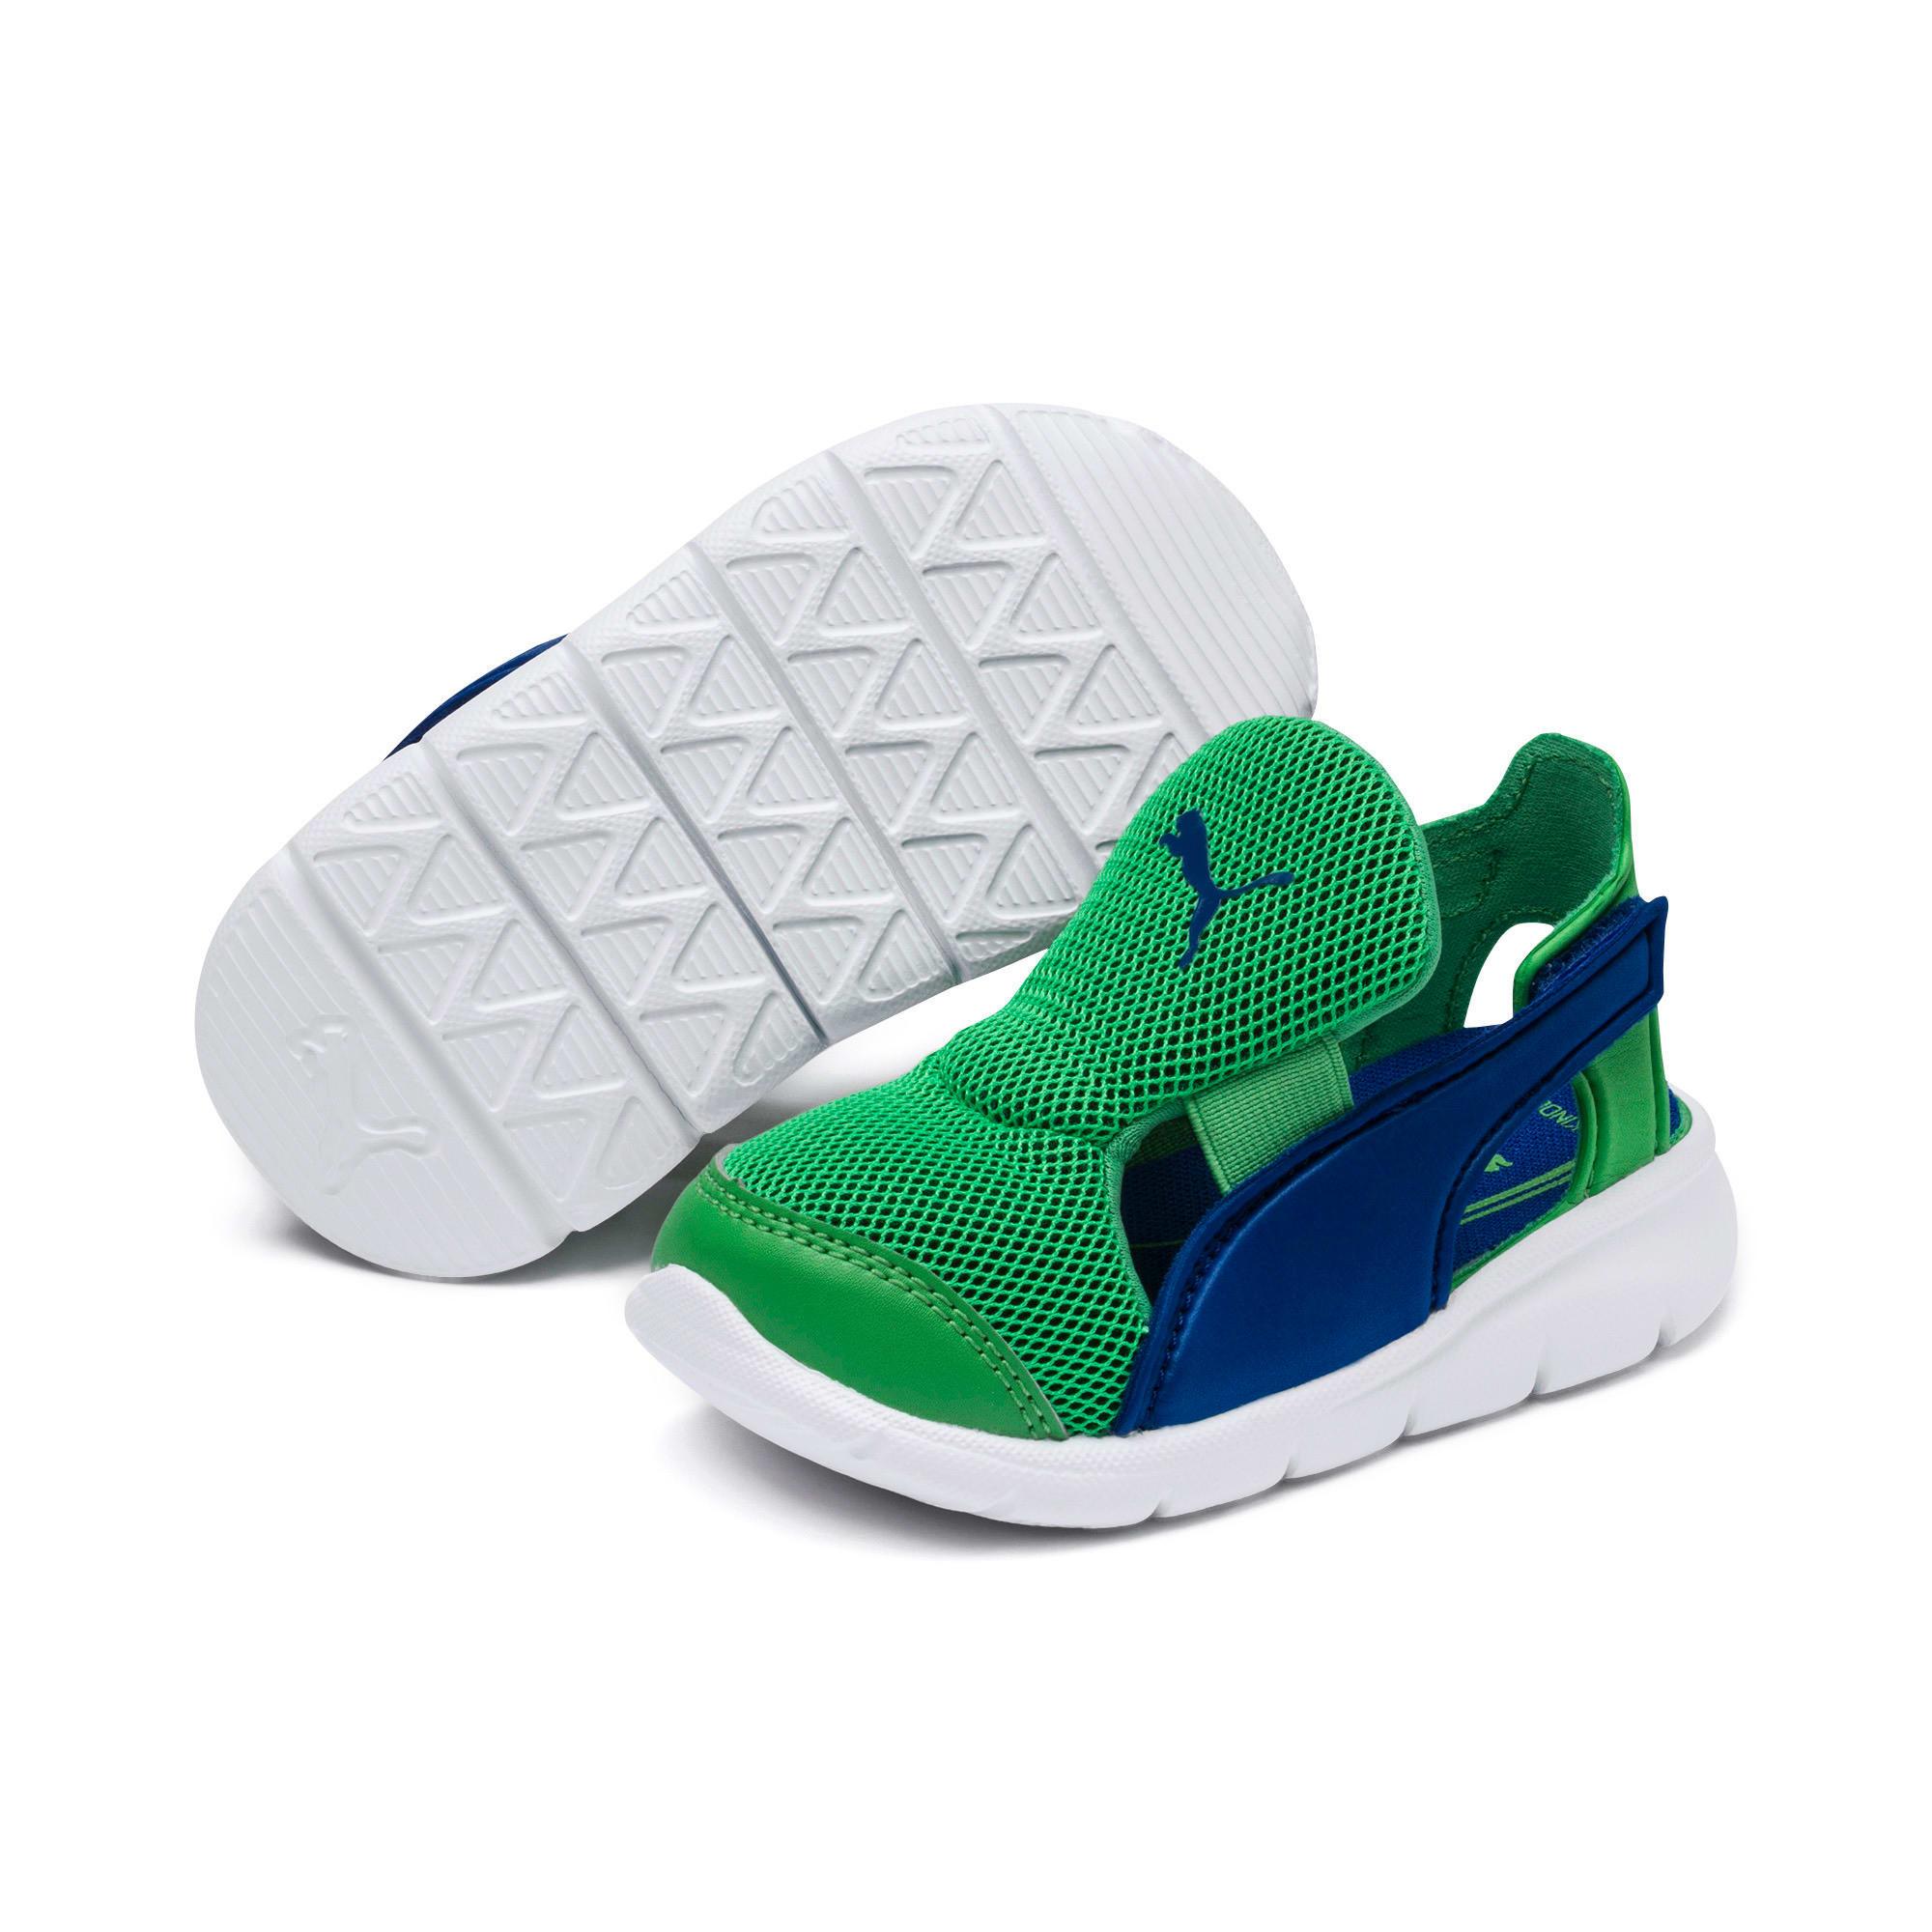 Thumbnail 2 of PUMA Bao 3 Open Toddler Shoes, Surf The Web-Irish Green, medium